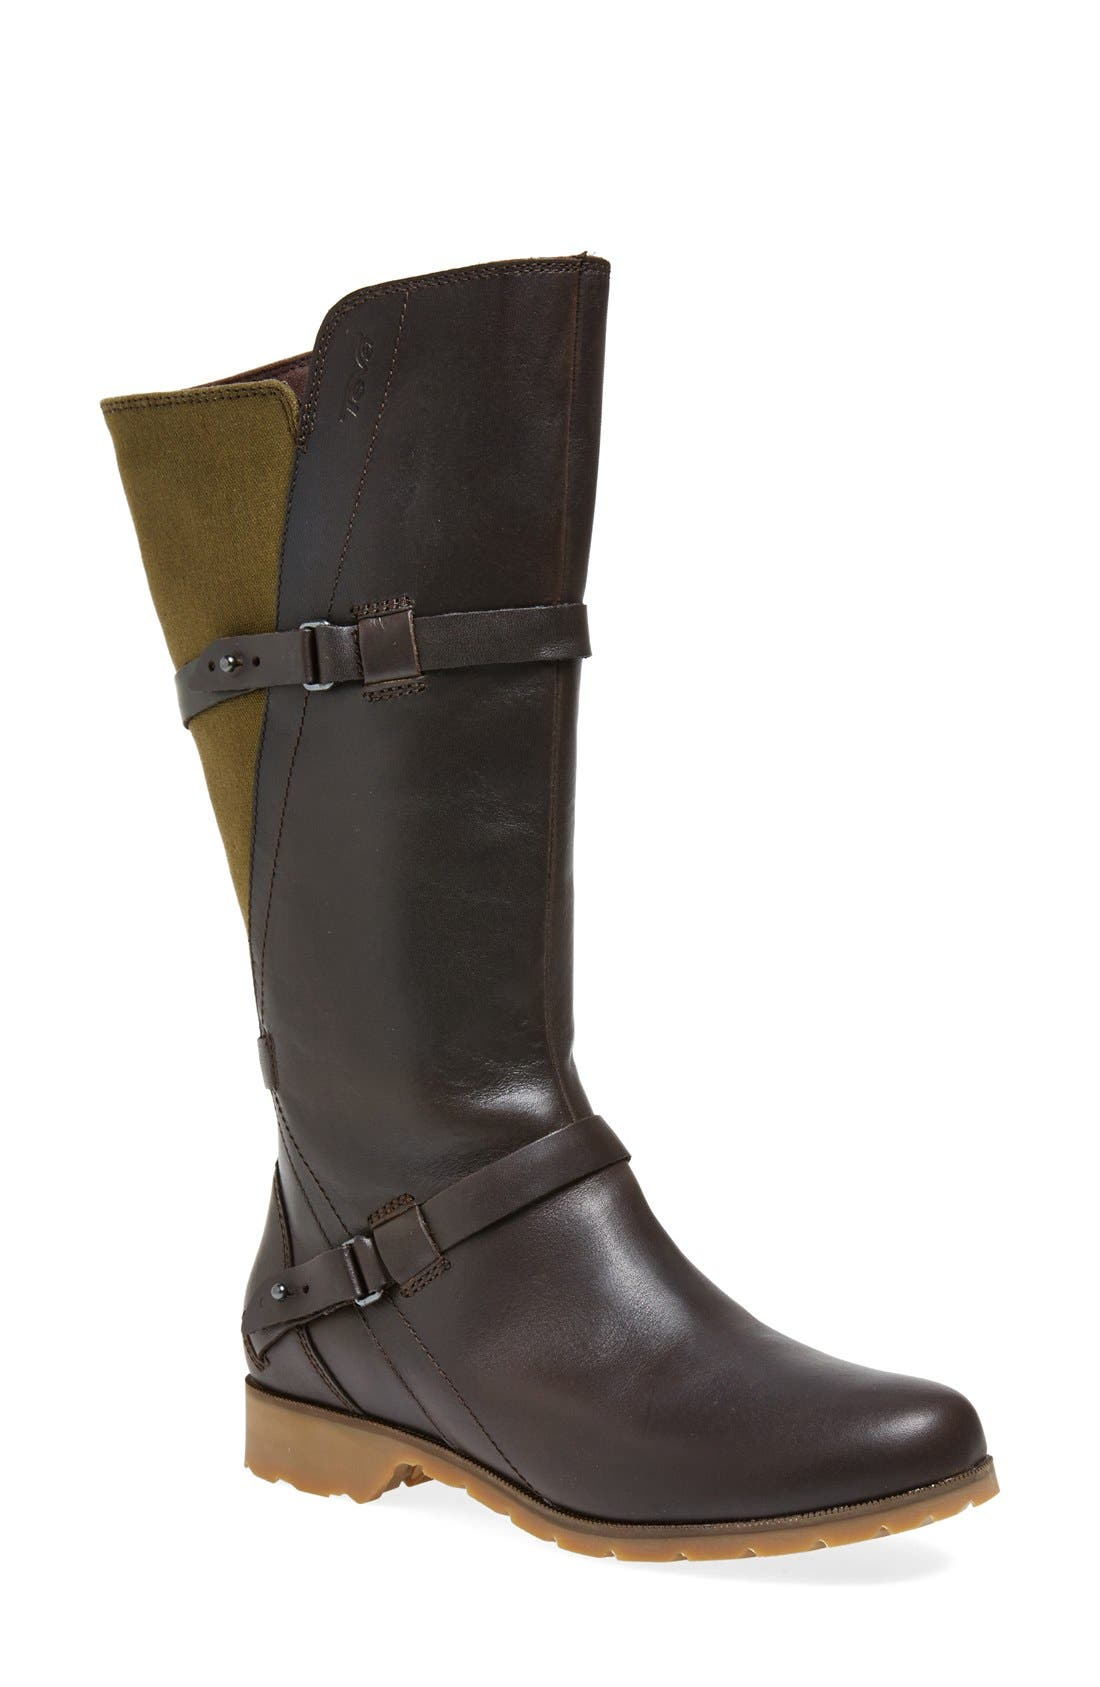 Main Image - Teva 'De La Vina' Boot (Women)